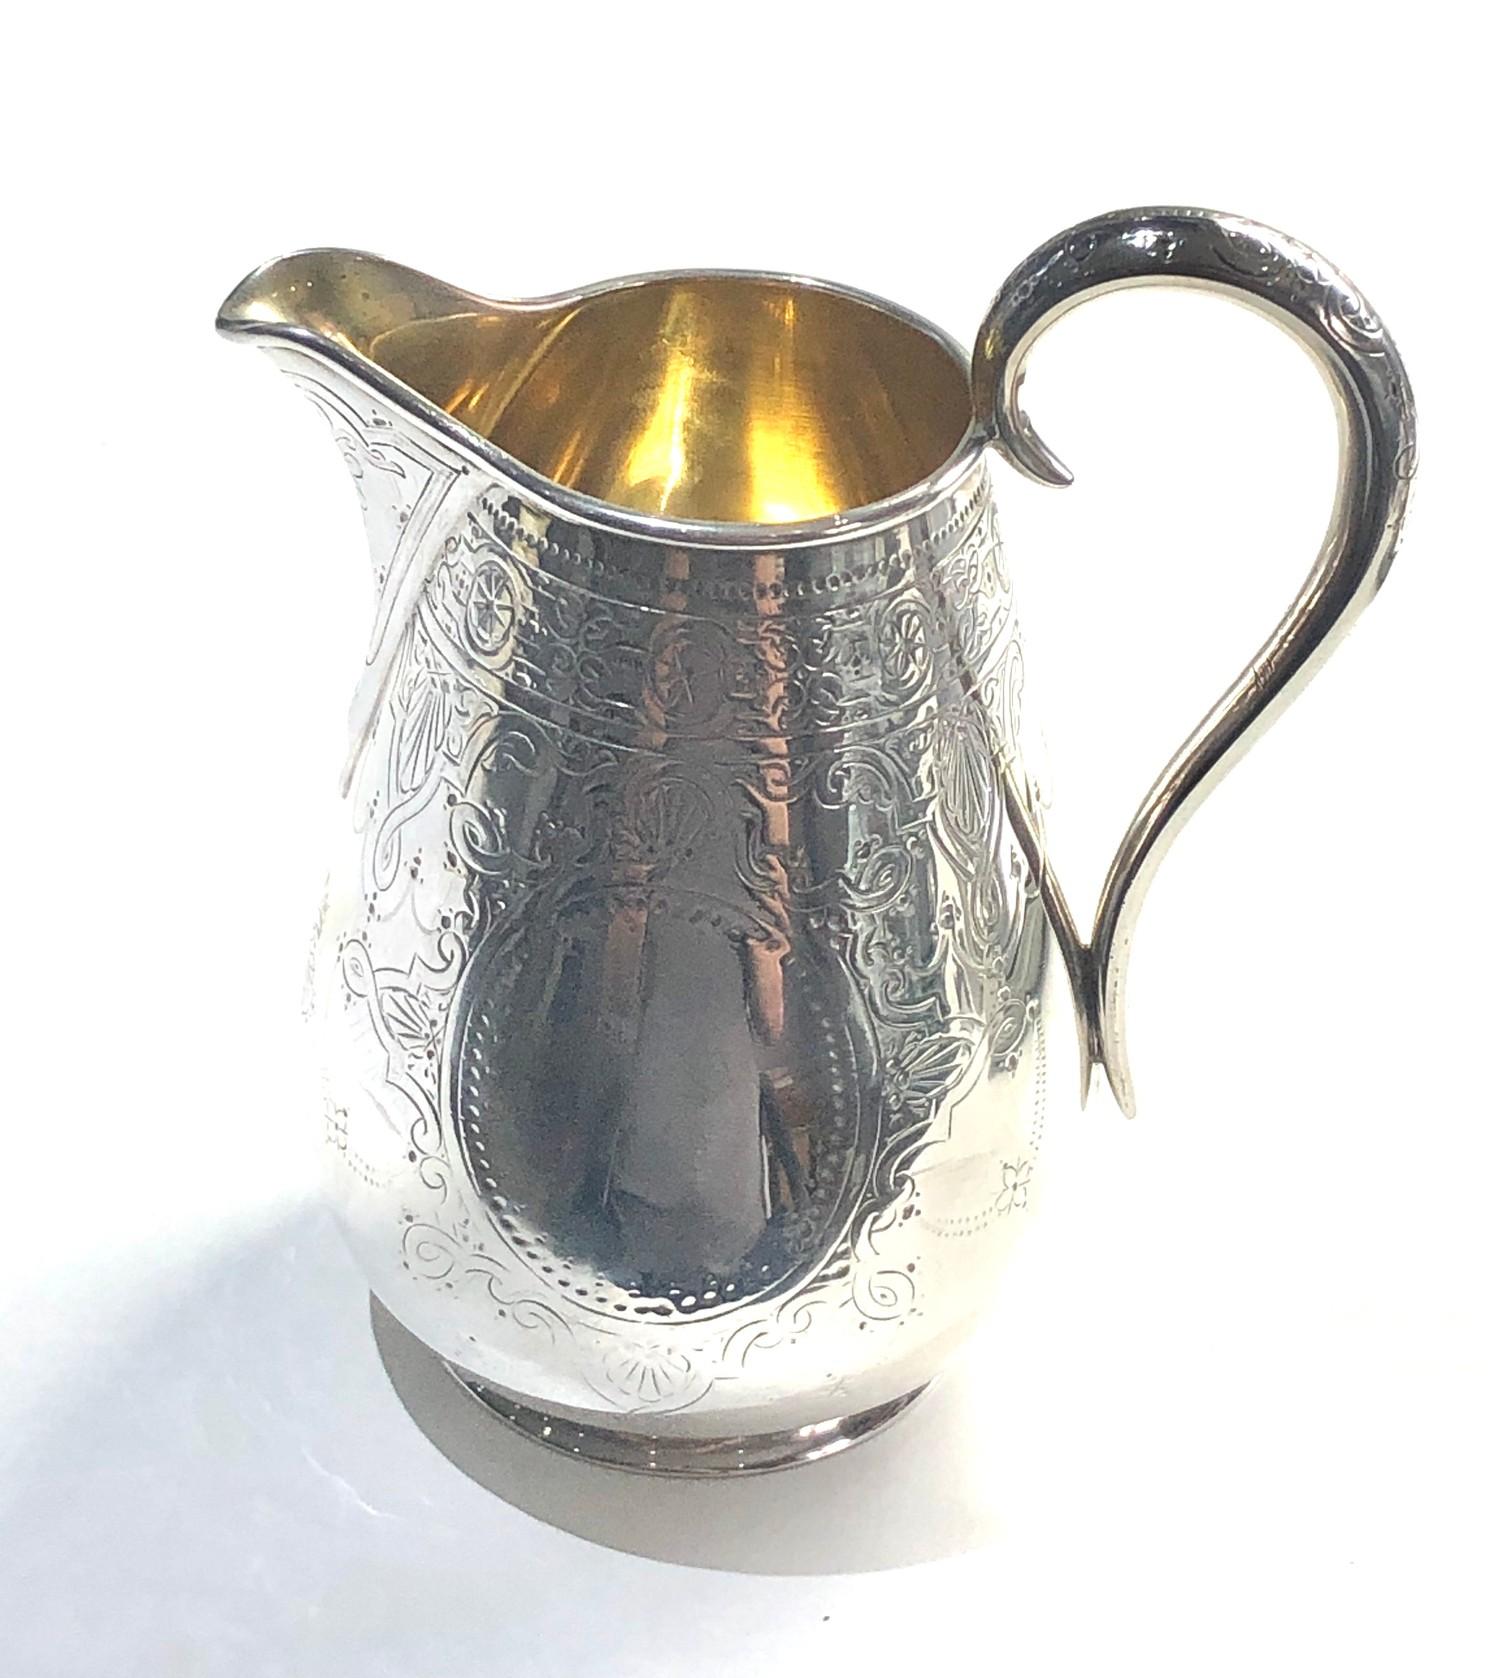 Large victorian silver milk jug London silver hallmarks weight 207g - Image 3 of 4